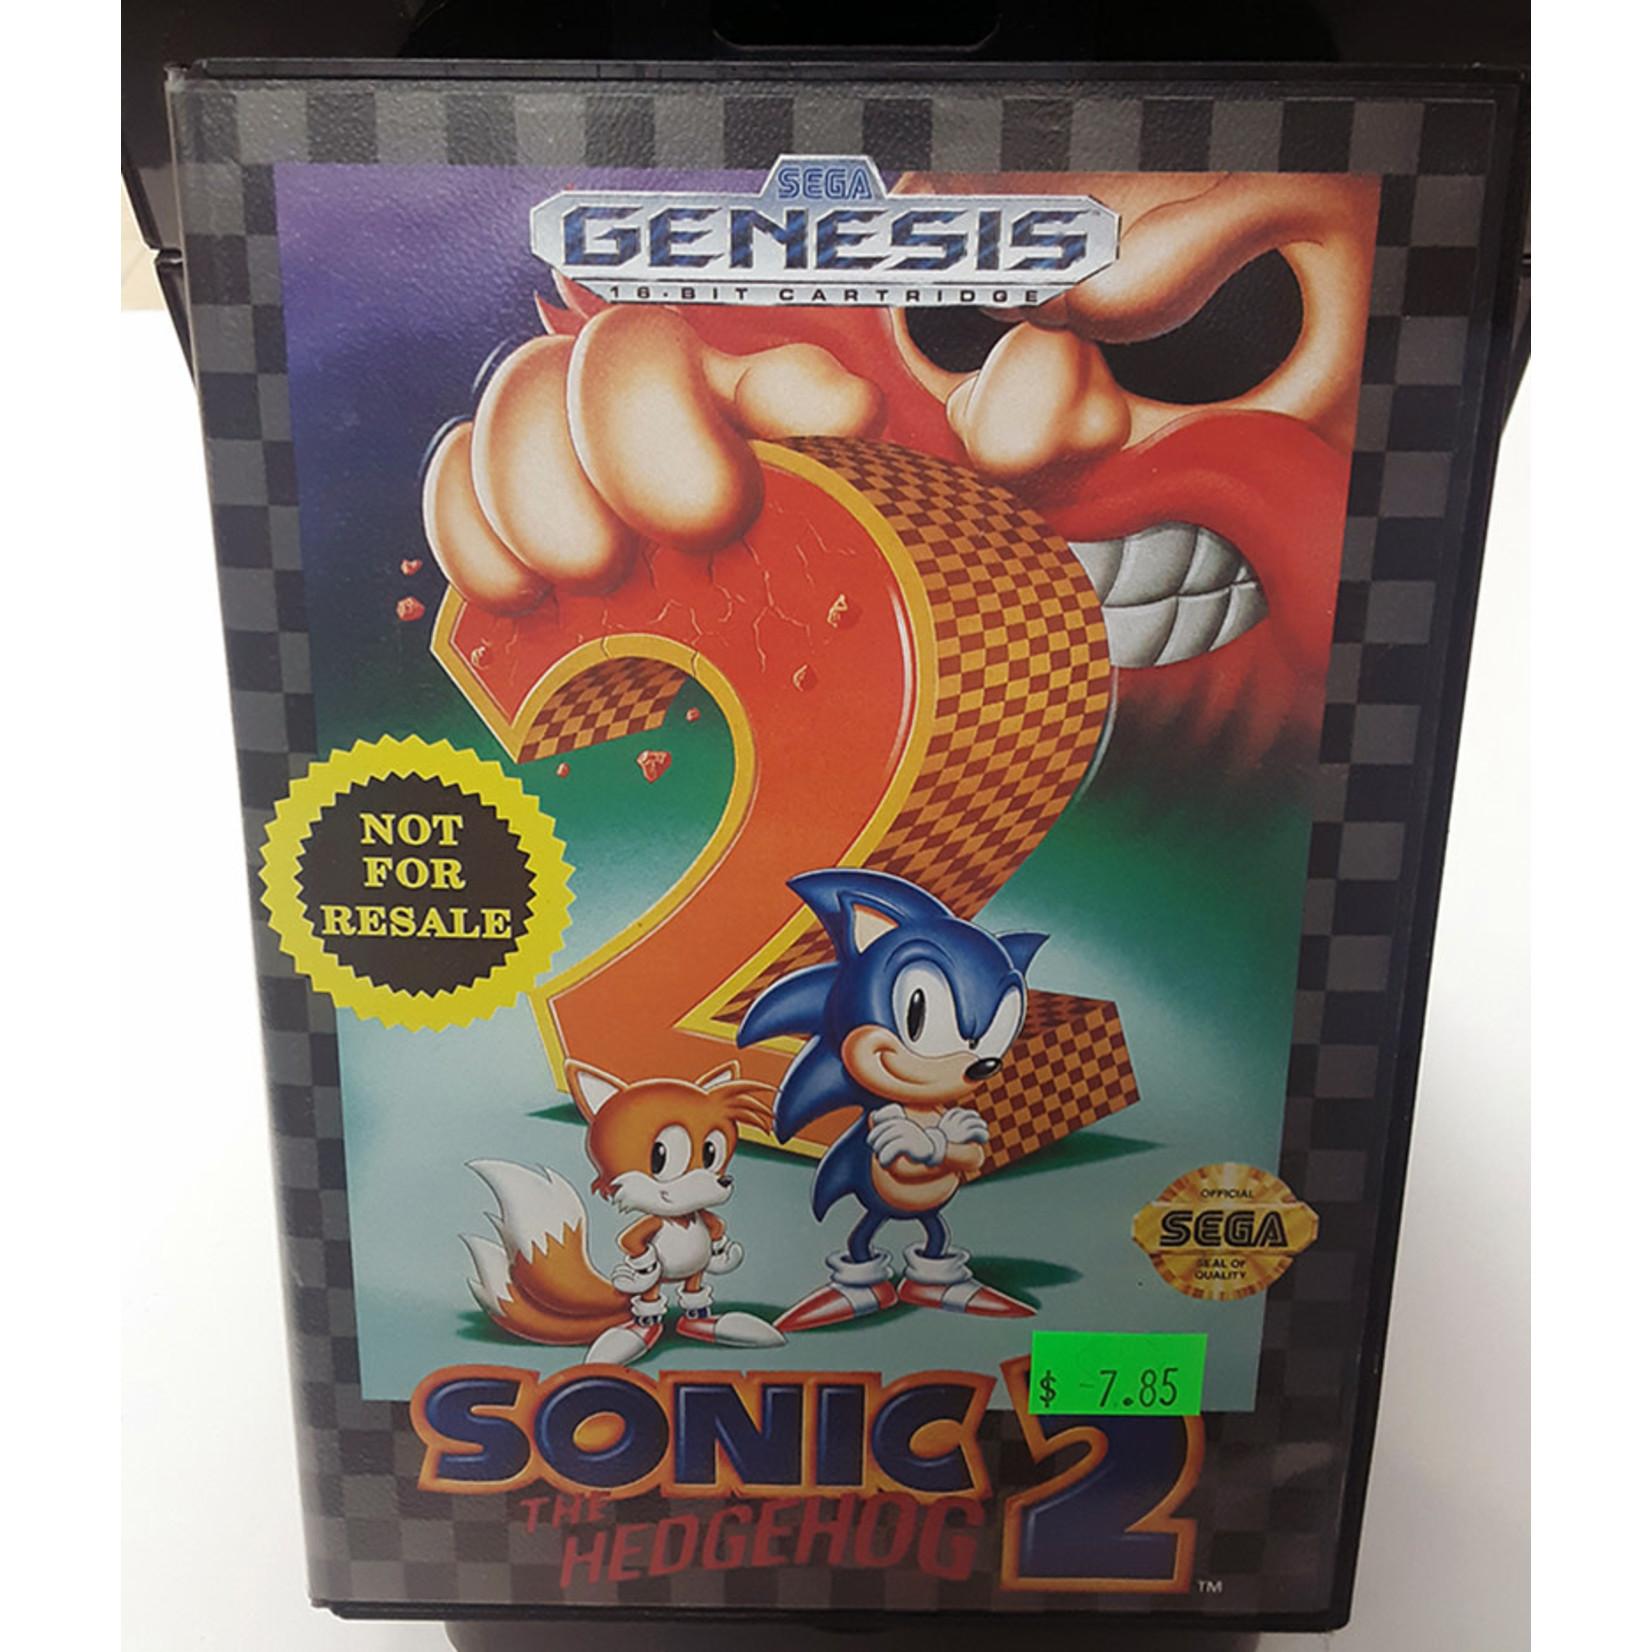 sgu-Sonic The Hedgehog 2 (in box)